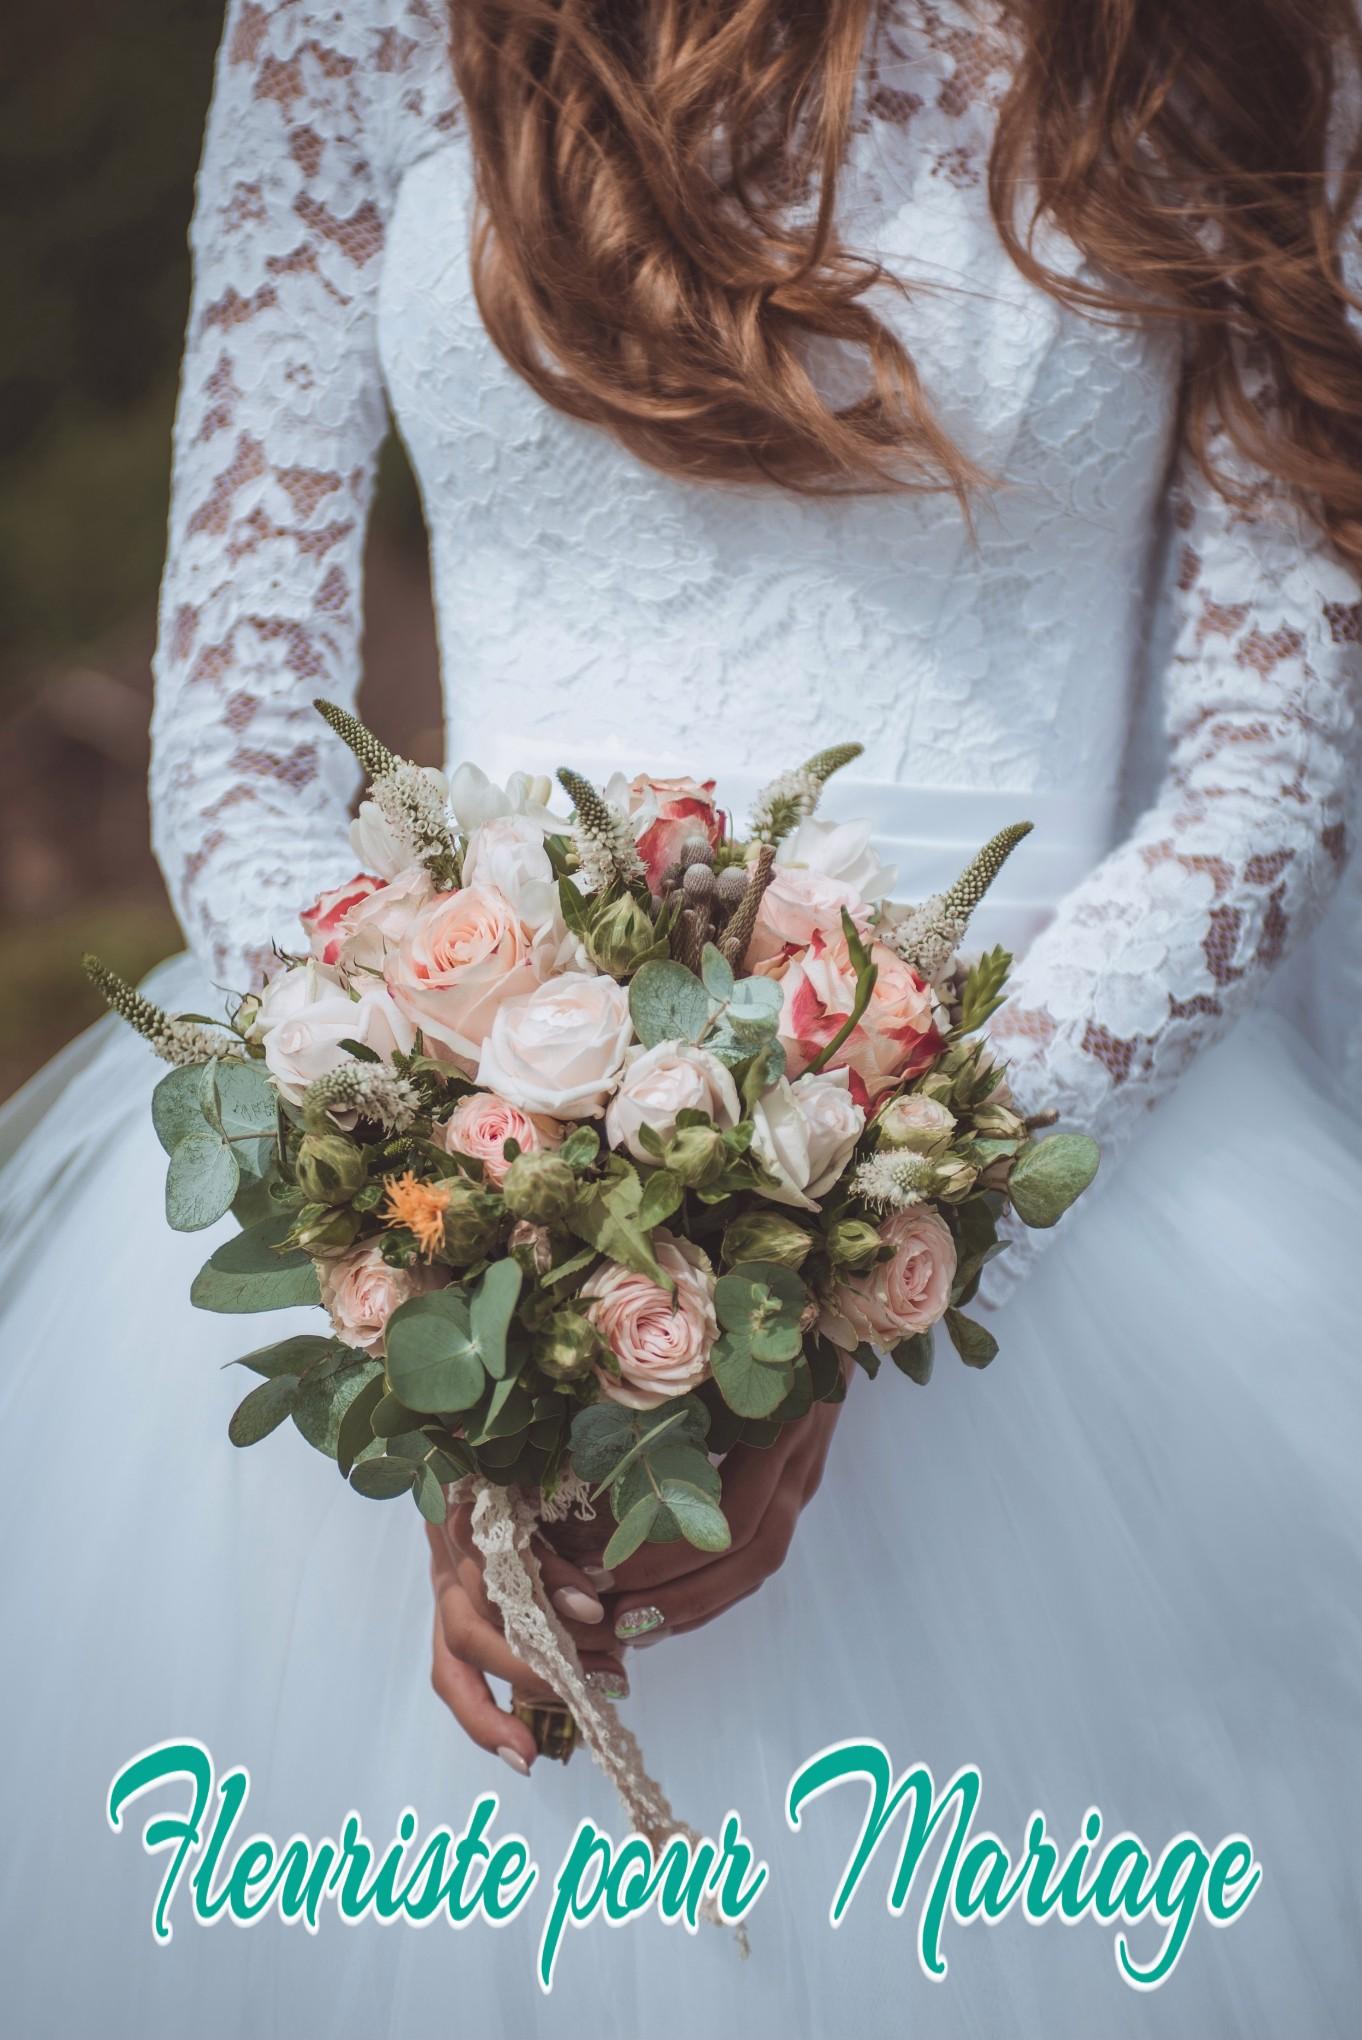 BOUQUETS DE MARIÉE OPIO- WEDDING FLEURISTE MARIAGE OPIO